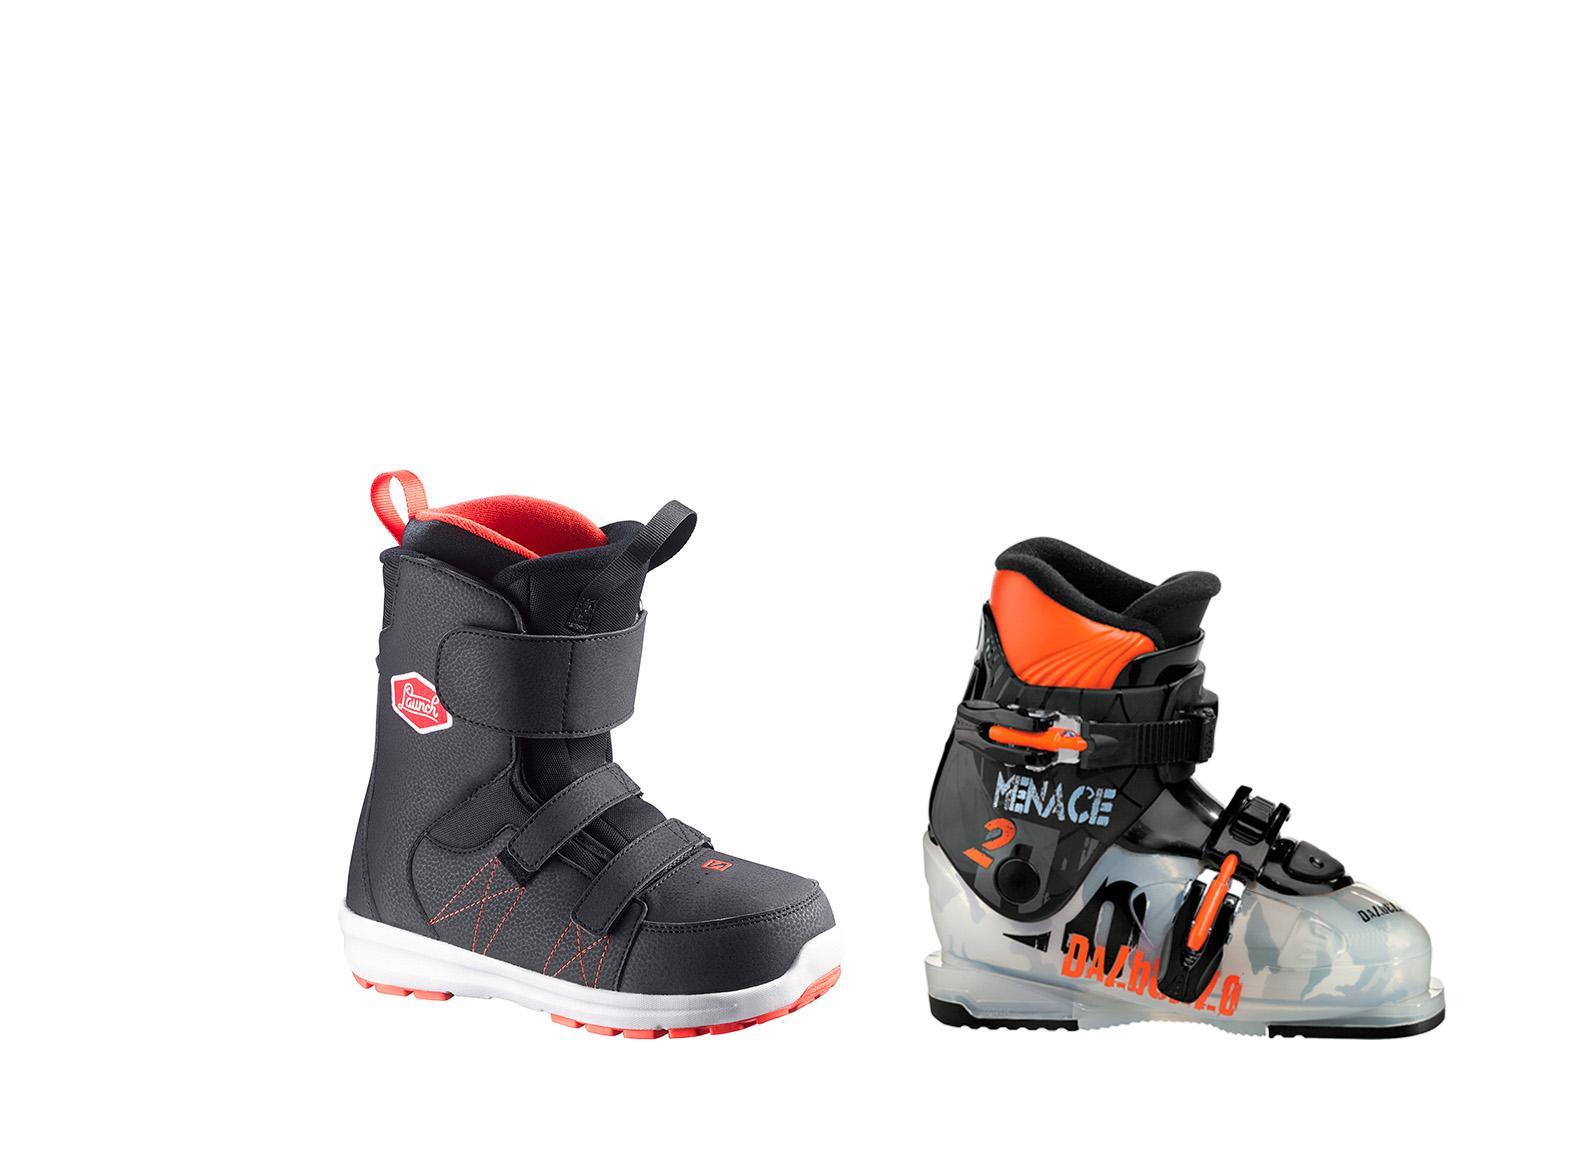 SKI-SNB-Schuhe-boots-kinder-kids-Rent-sport-SAILER-Seefeld-Rosshuette-Tirol-Oesterreich-002